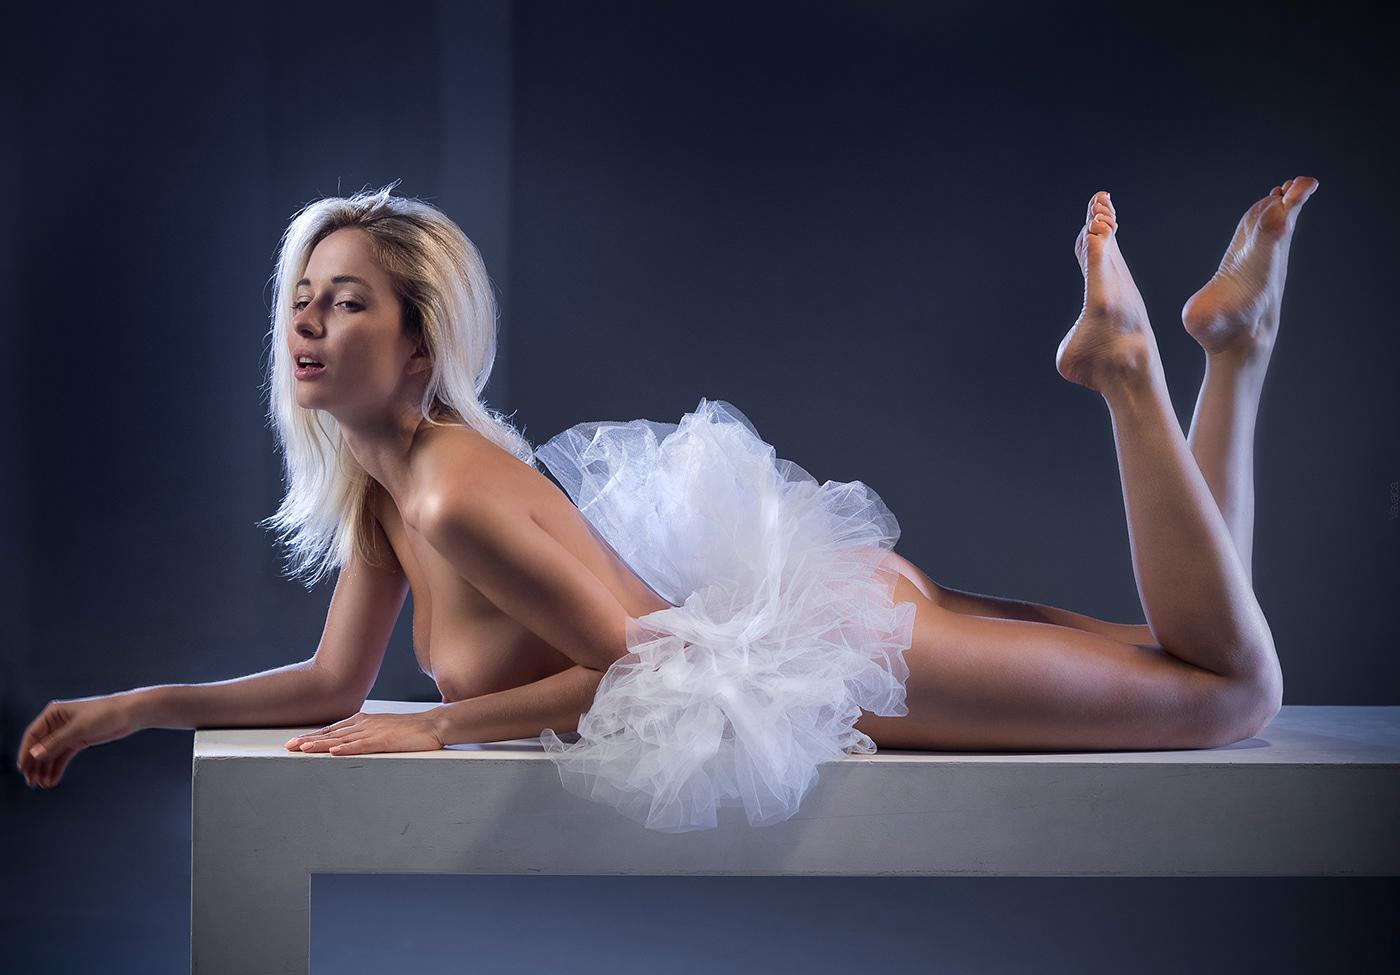 Model Natalia Andreeva foto Vladimir Nikolaev | Наталия Андреева фото Владимир Николаев